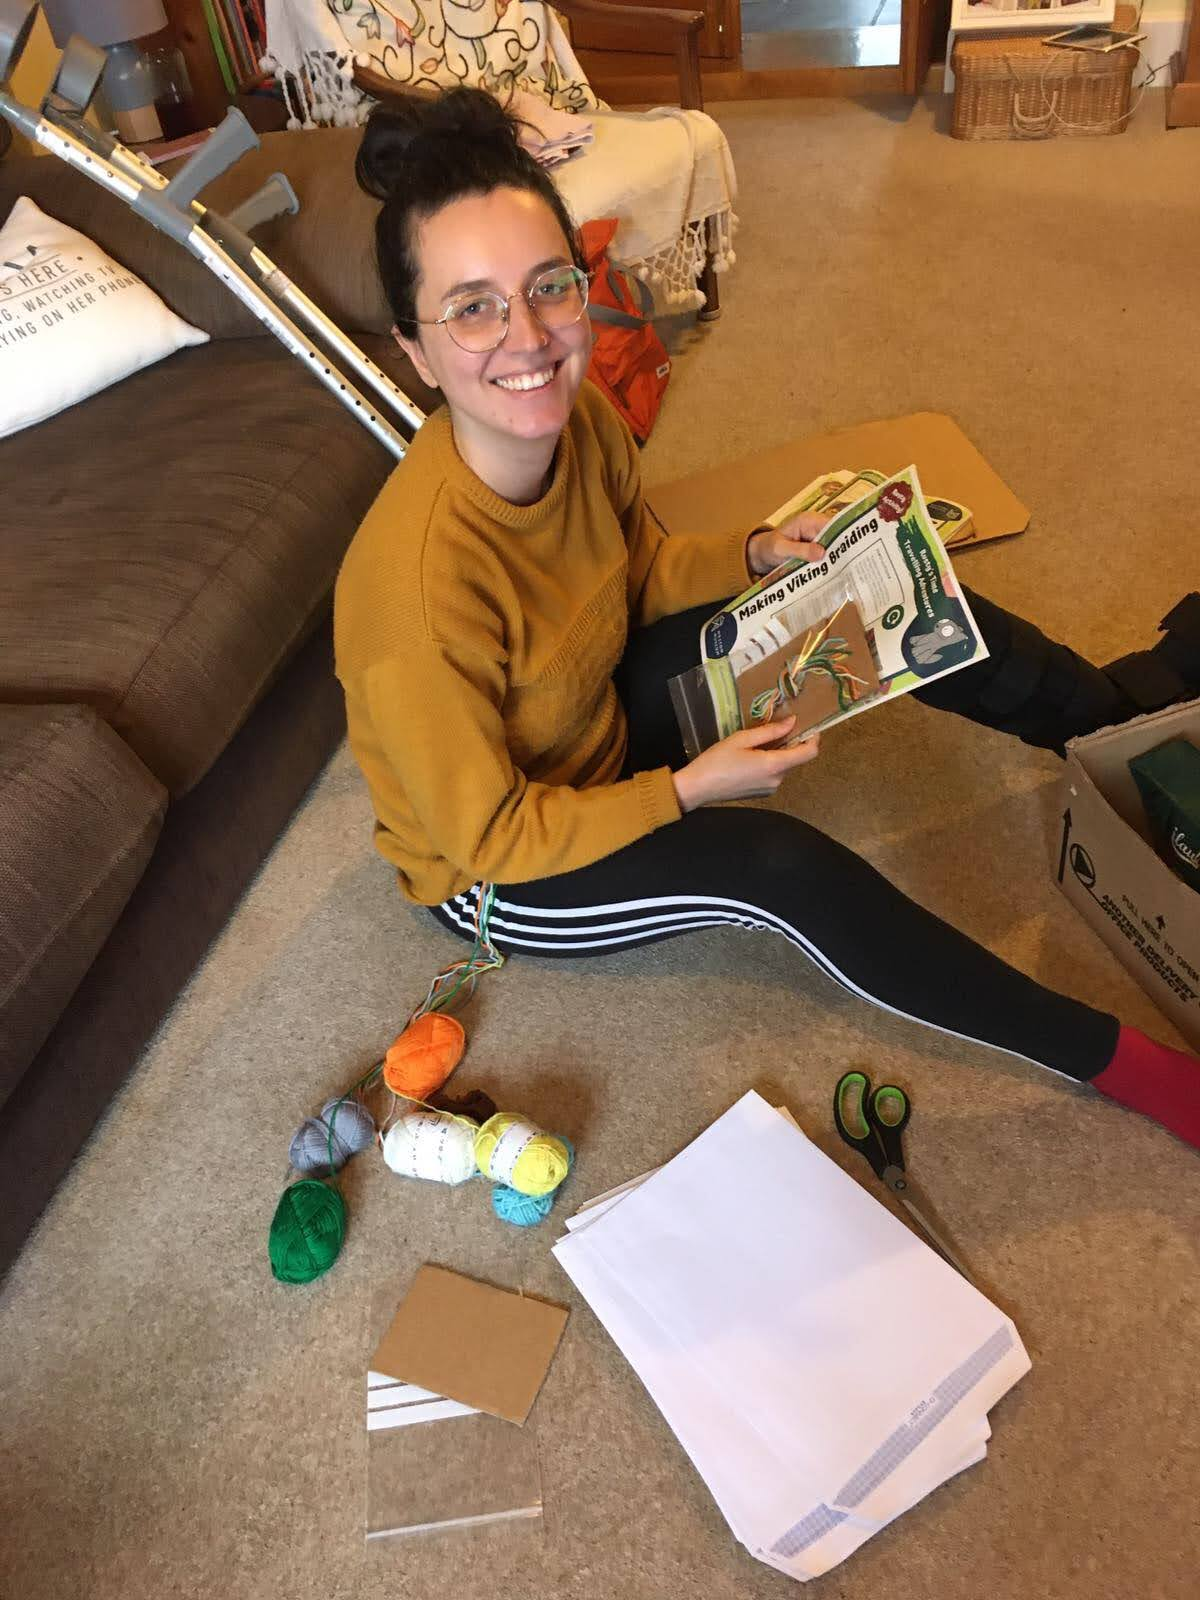 Michaela assembling craft packs